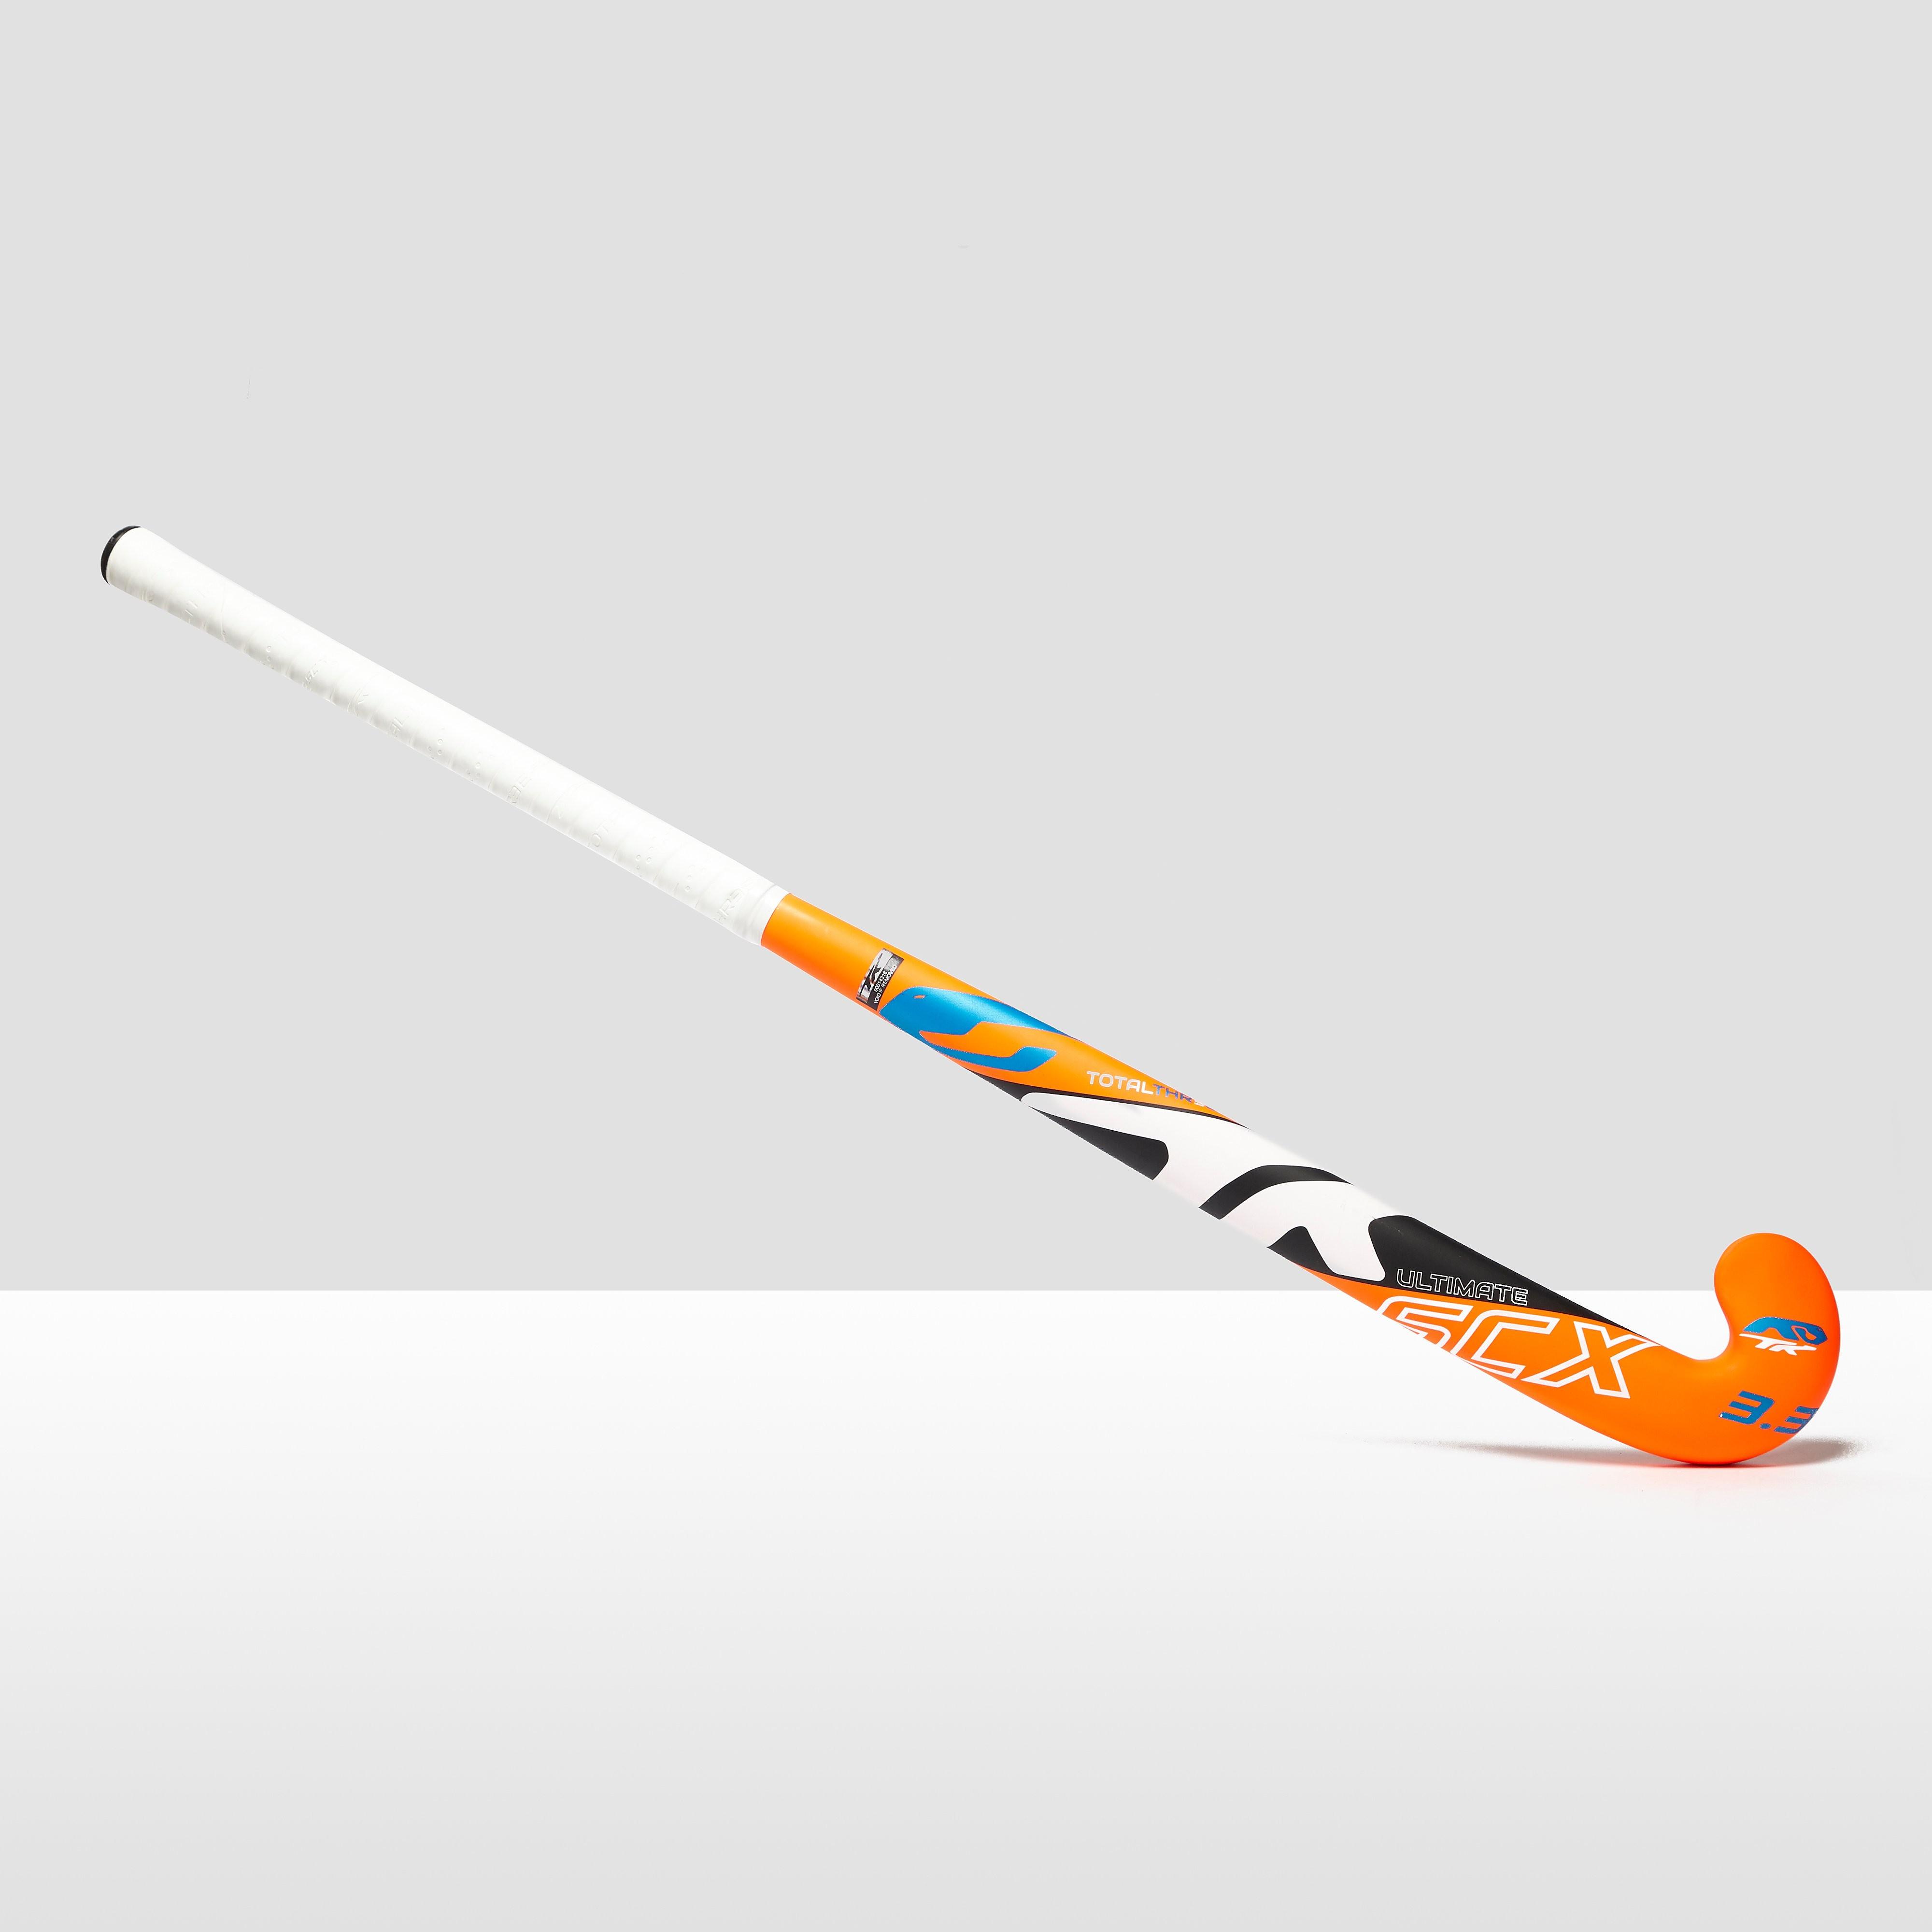 TK Hockey Total Three Scx 3.3 Ultimate Hockey Stick